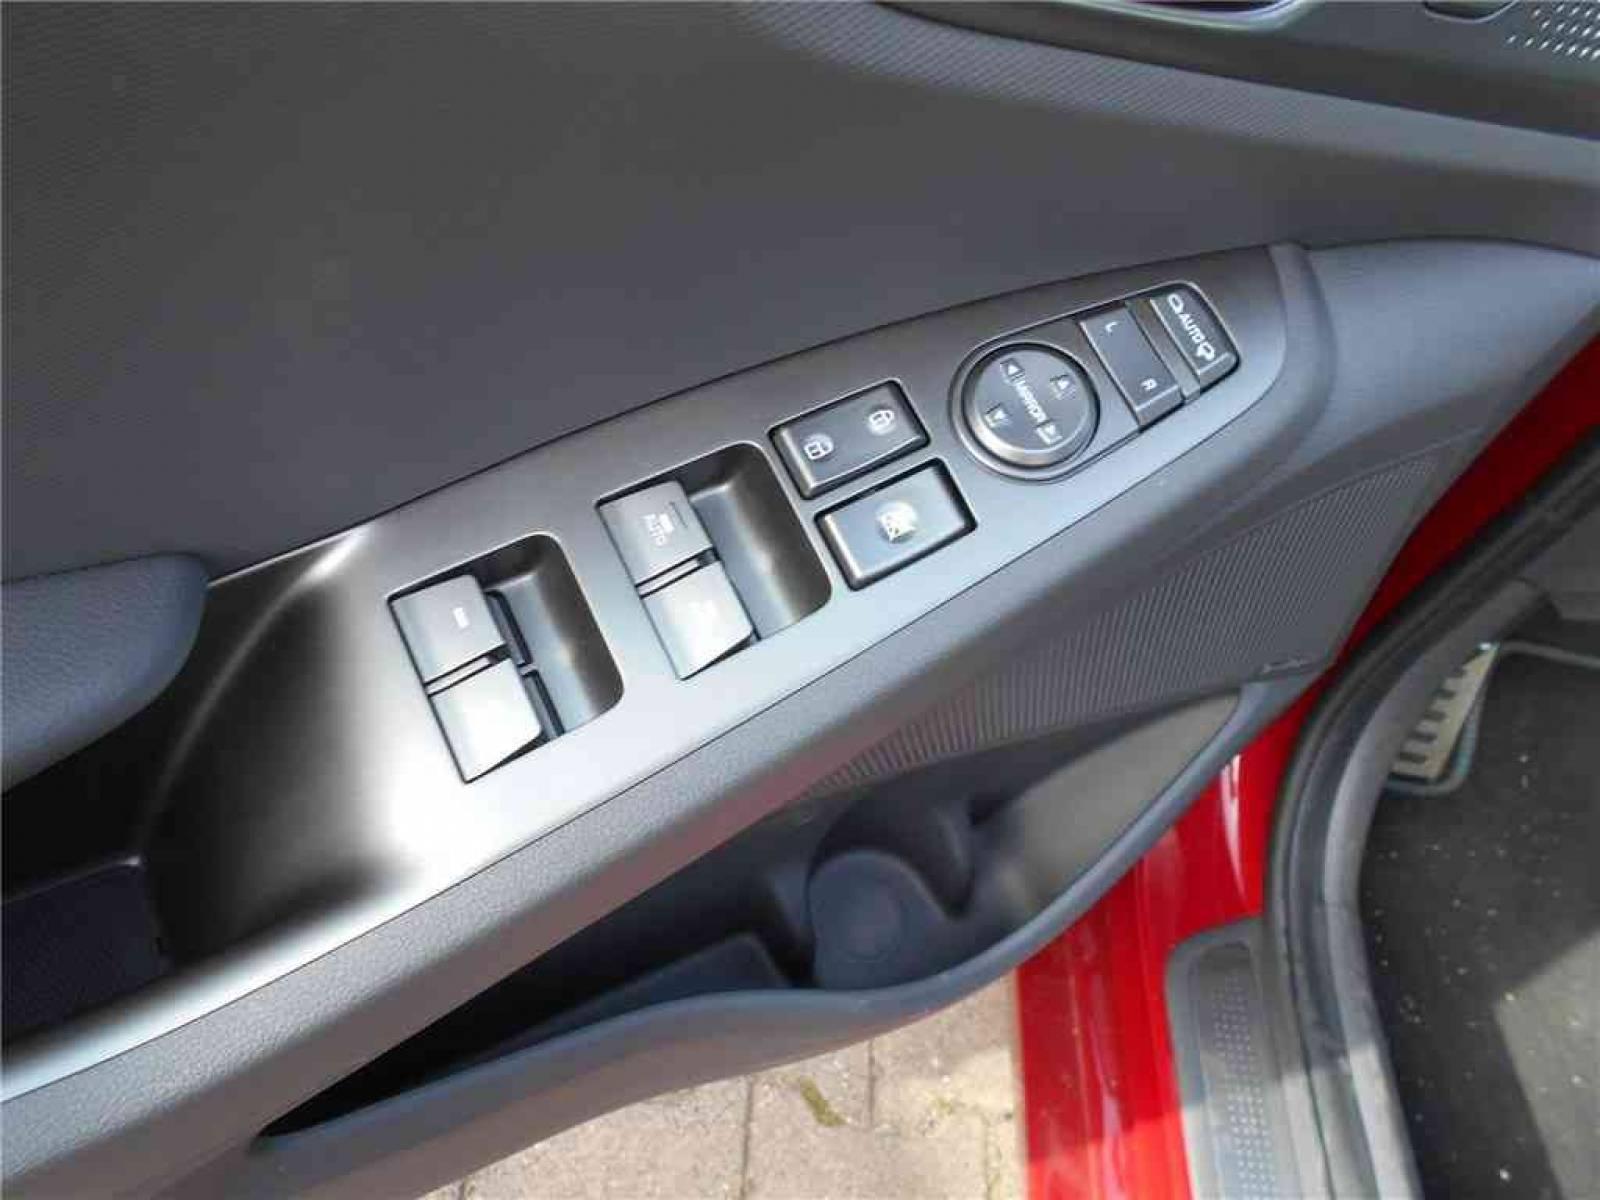 HYUNDAI Ioniq Plug-in 141 ch - véhicule d'occasion - Groupe Guillet - Chalon Automobiles - 71100 - Chalon-sur-Saône - 21